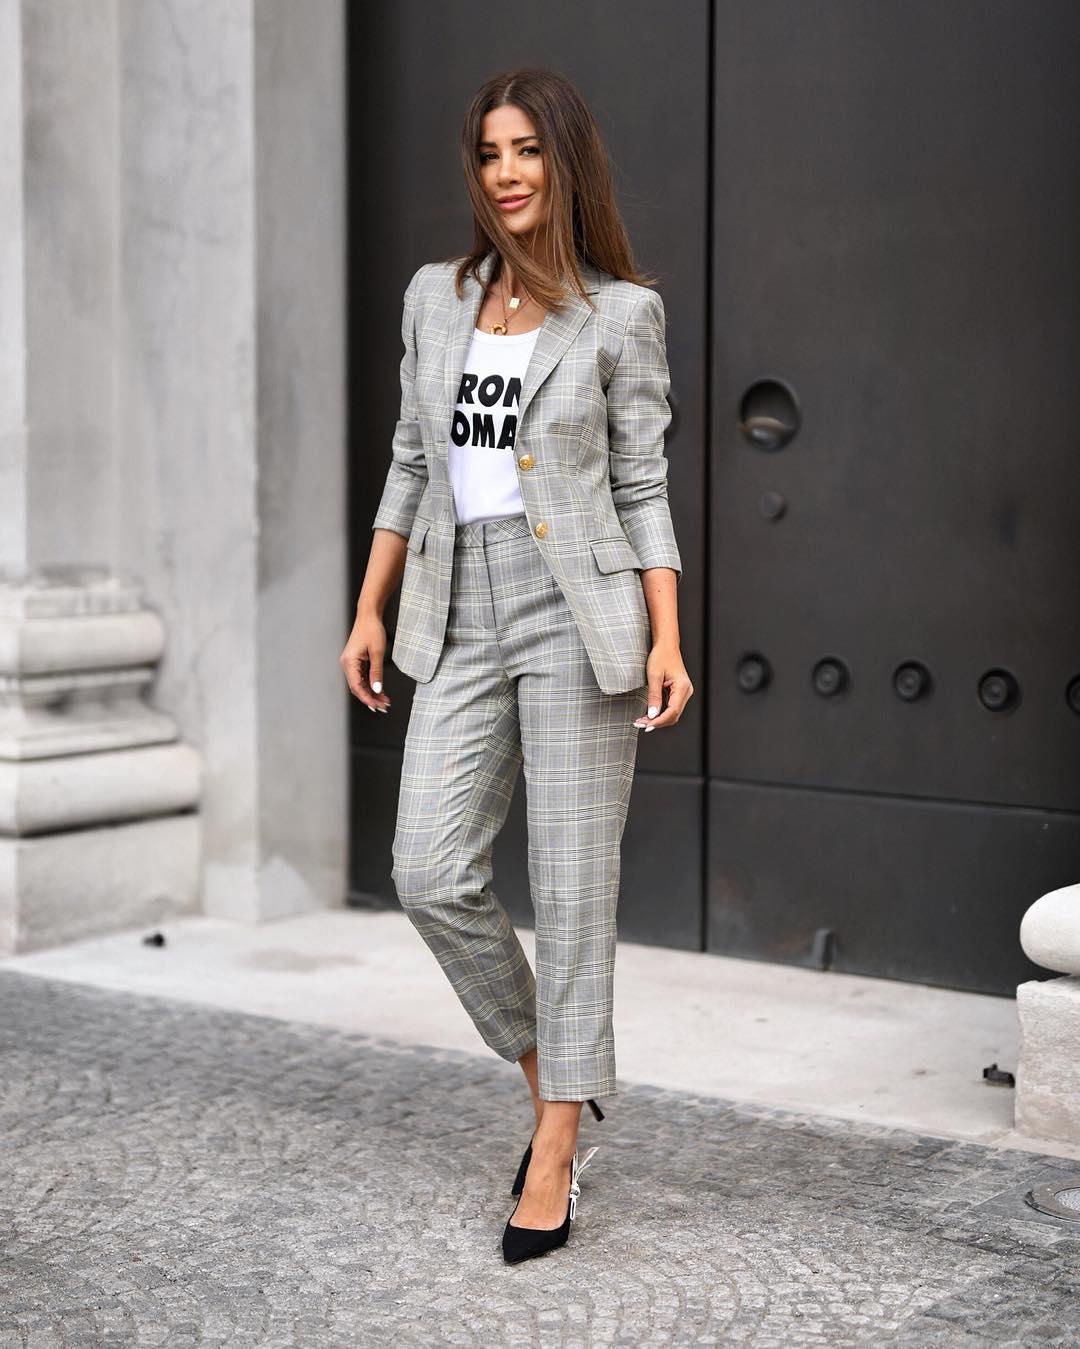 брюки женские 2019 фото 13